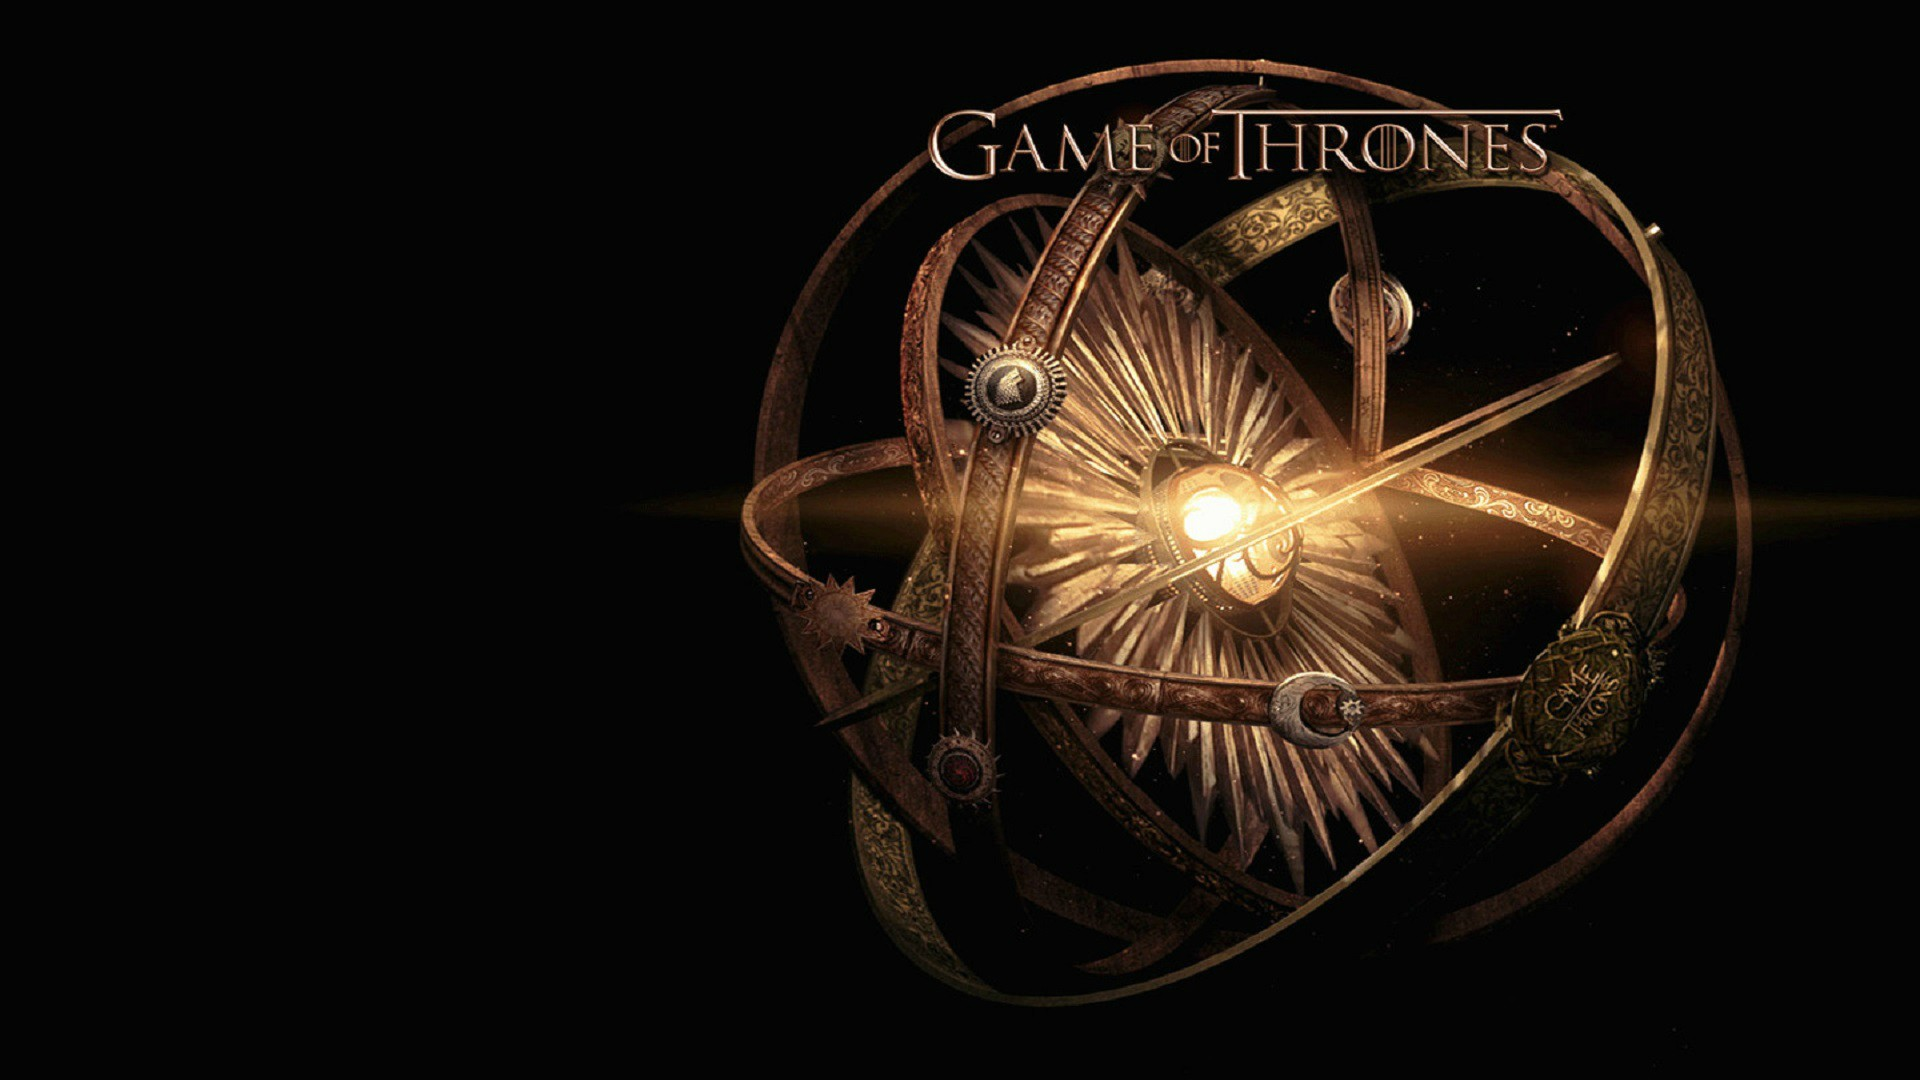 Game of Thrones Wallpaper Widescreen - WallpaperSafari